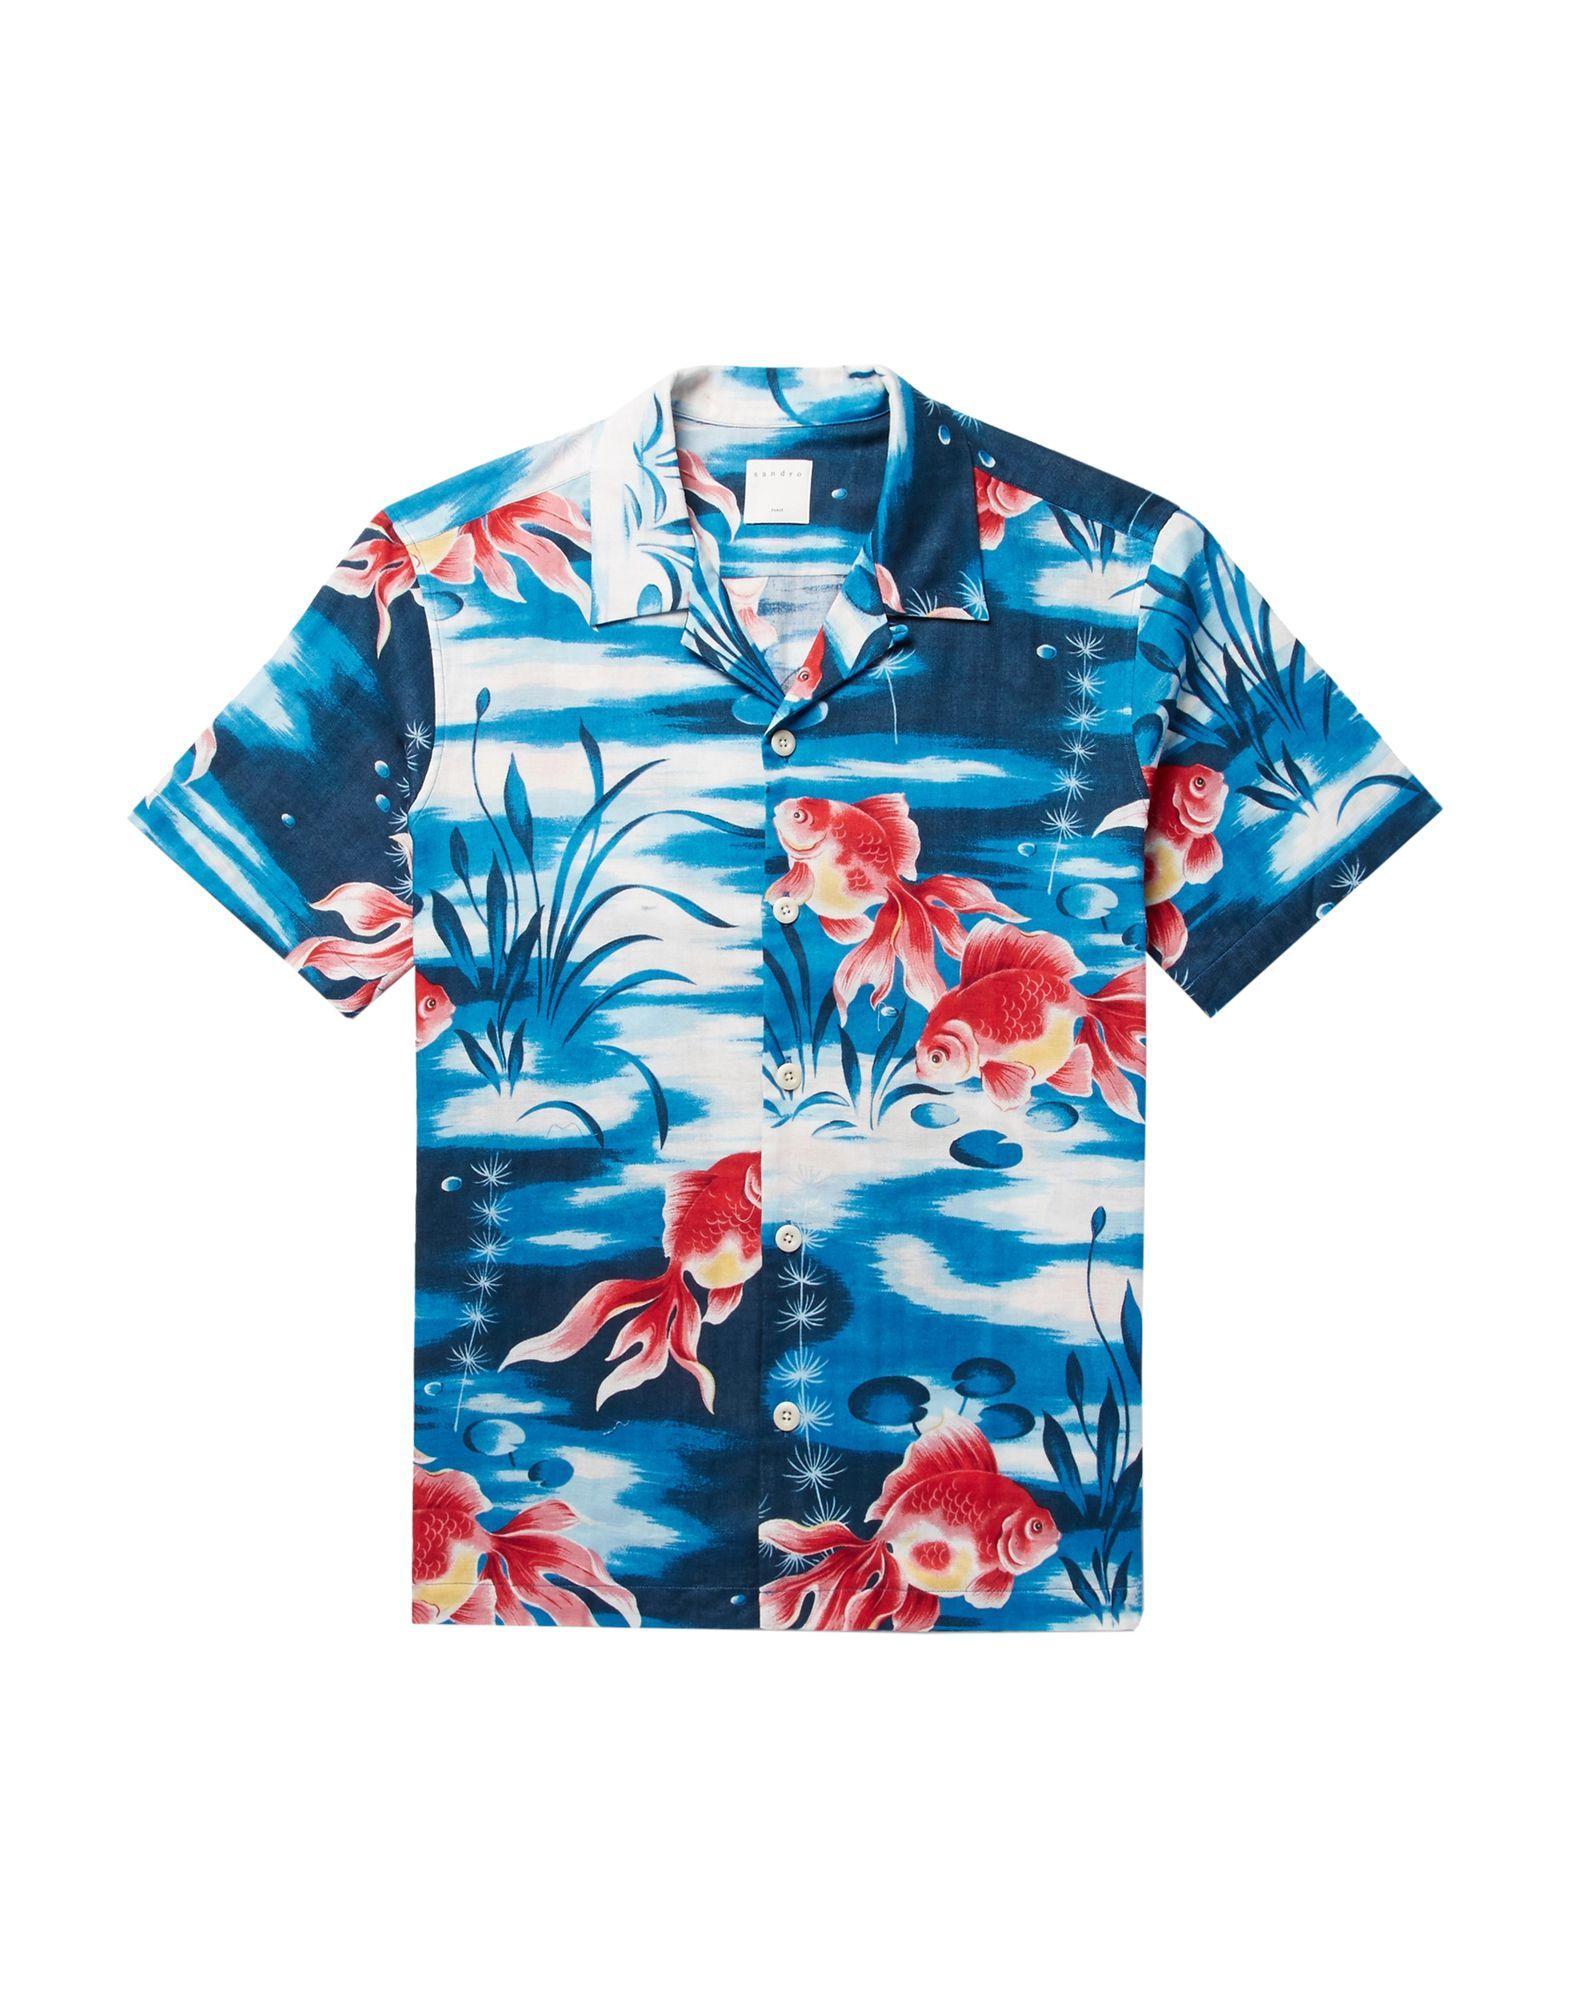 Sandro Man Shirts Cotton